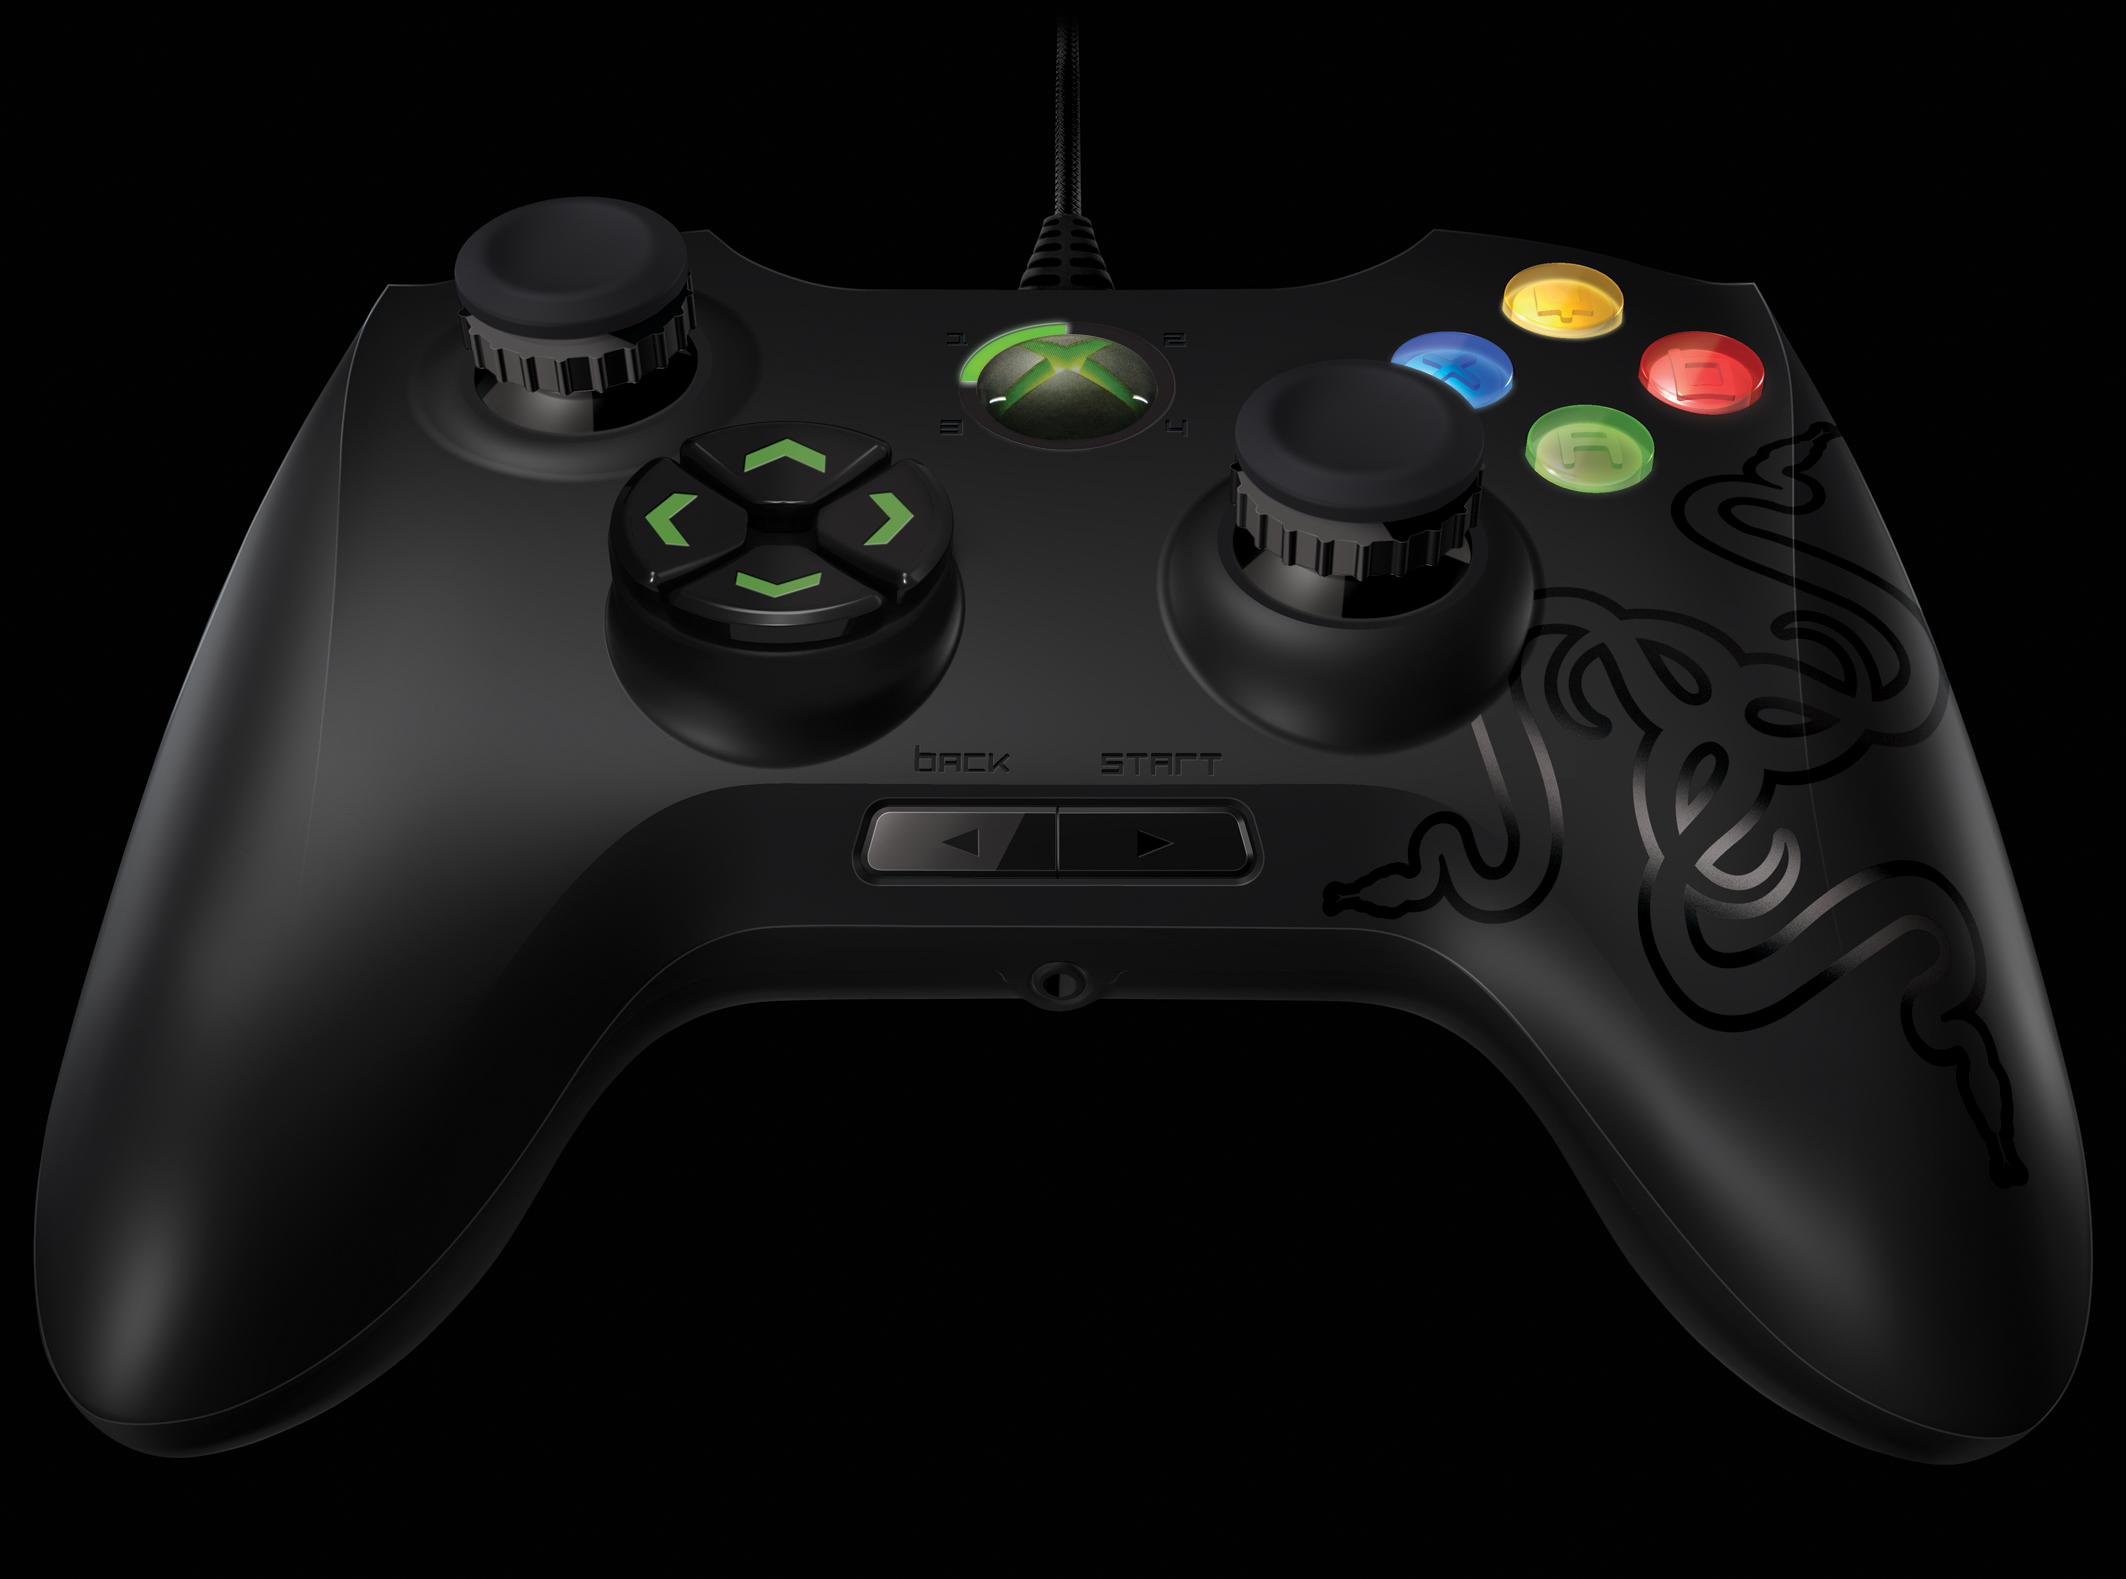 Razer Onza Tournament Edition Review Capsule Computers Logitech F710 Gamepad Stick Wireless Joystick For Pc Garansi Resmi